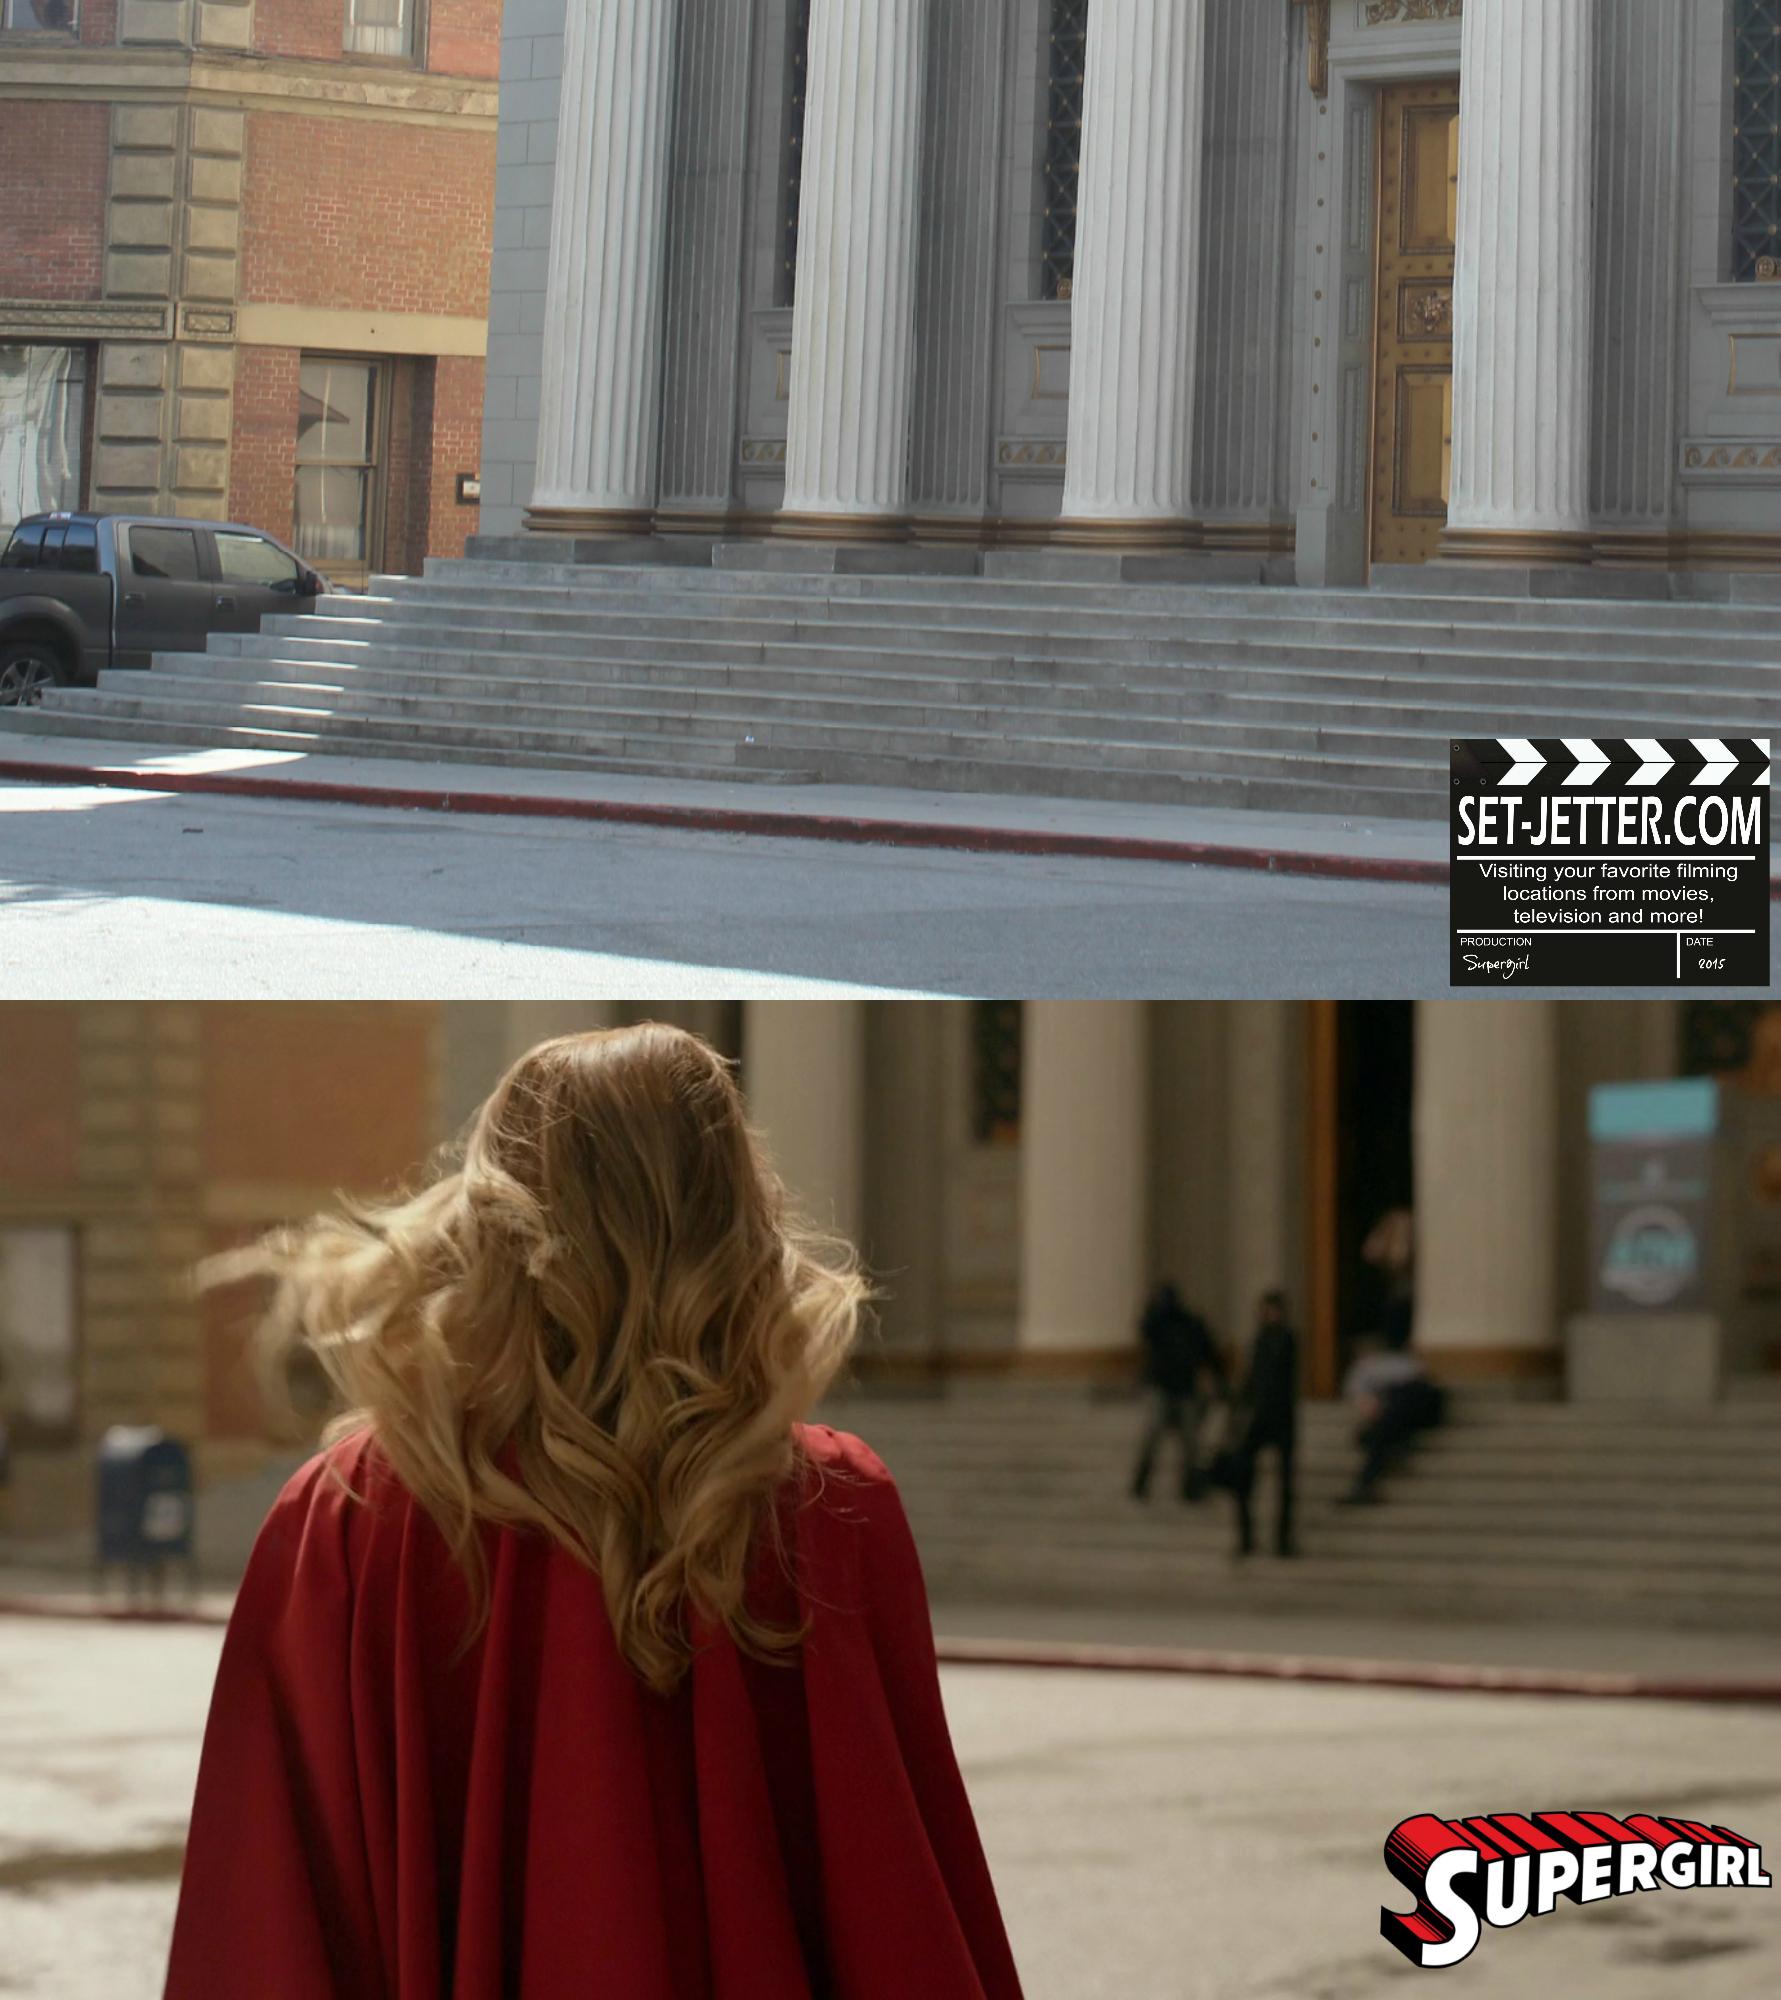 Supergirl comparison 21.jpg